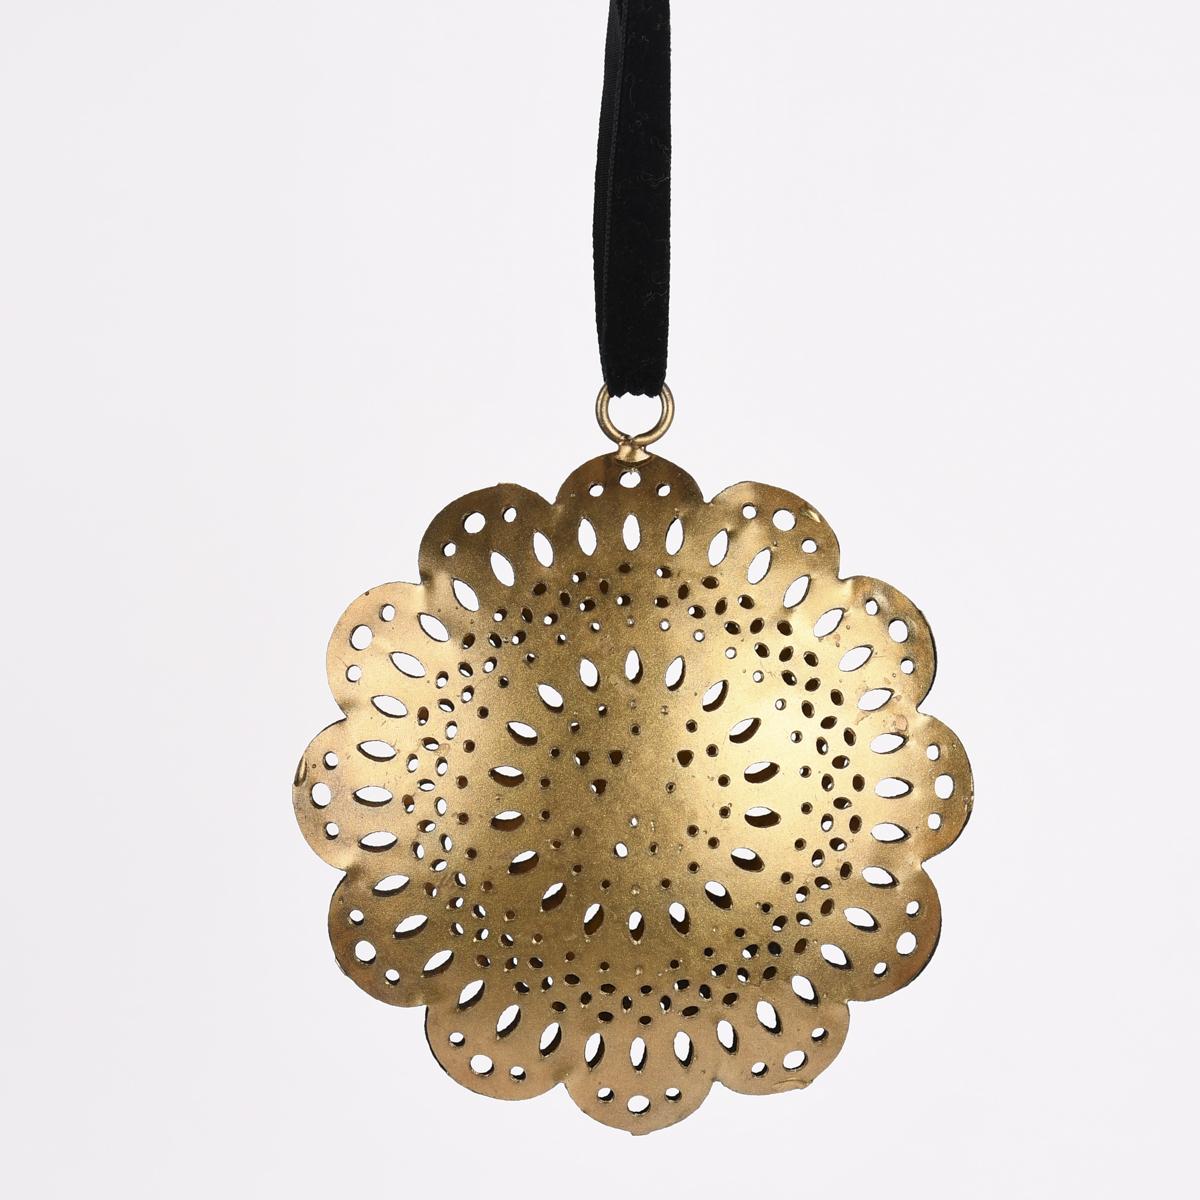 Deko Hänger 3D Ornament Metall Cut-Out messingfarbig 4x11cm